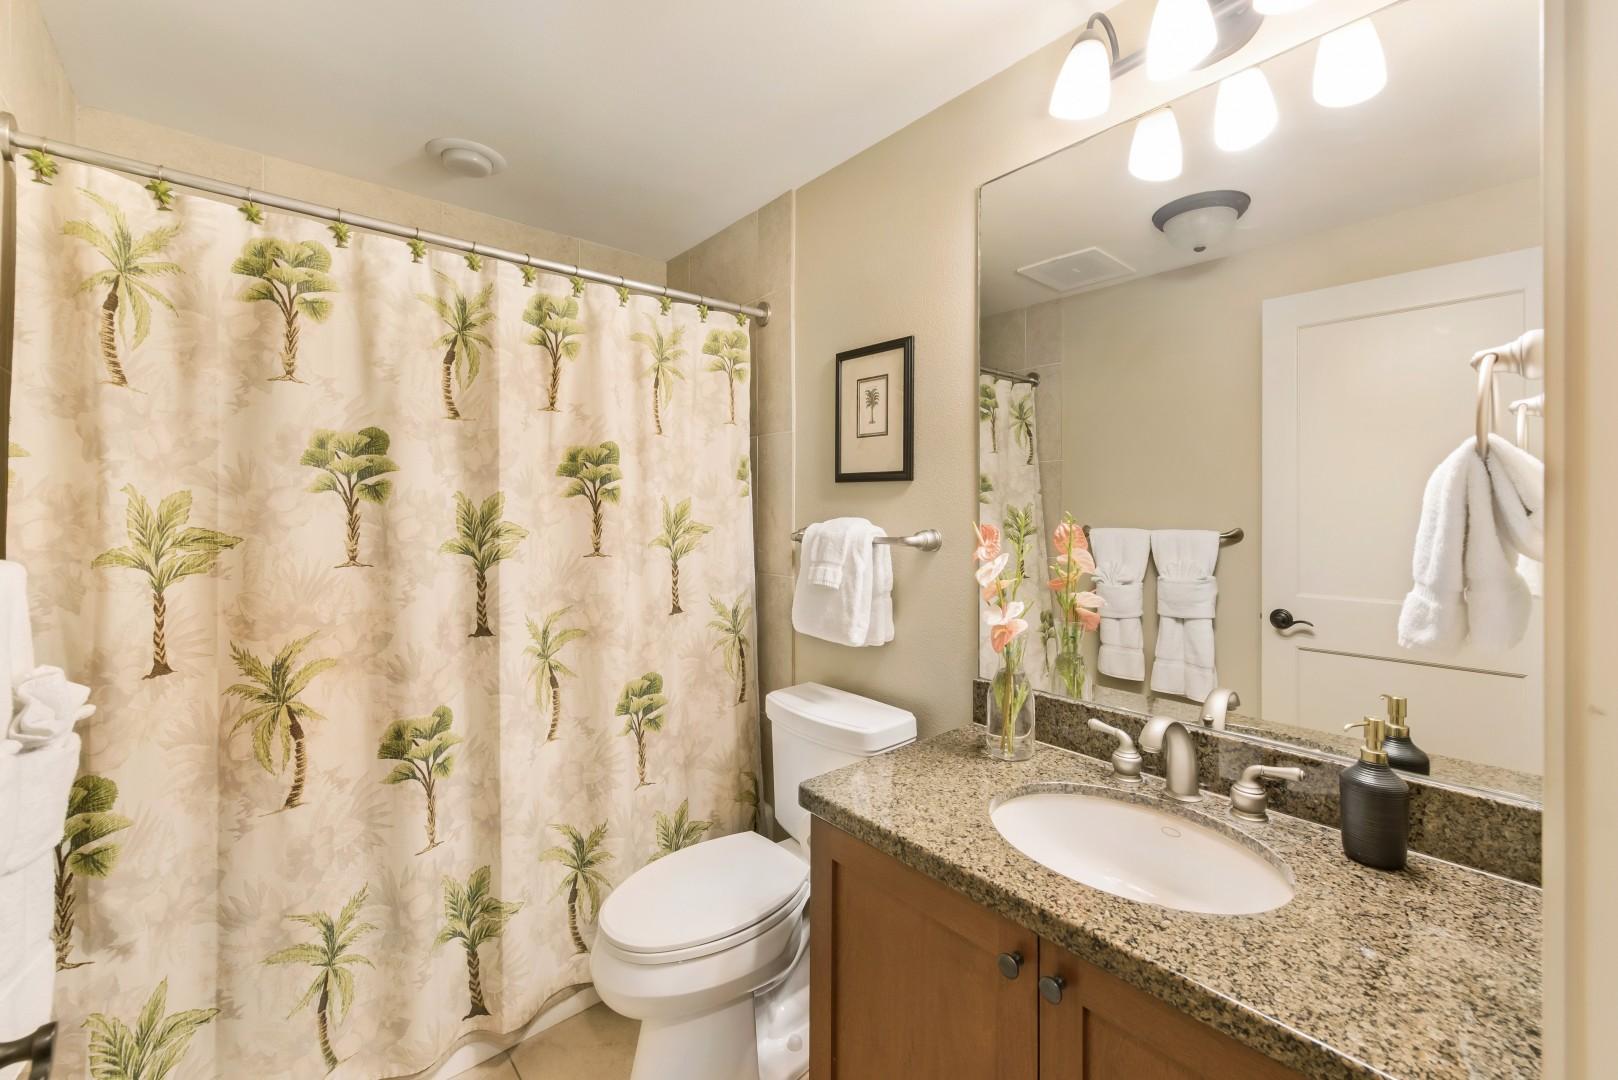 Downstairs guest bathroom, adjacent to bedroom 3